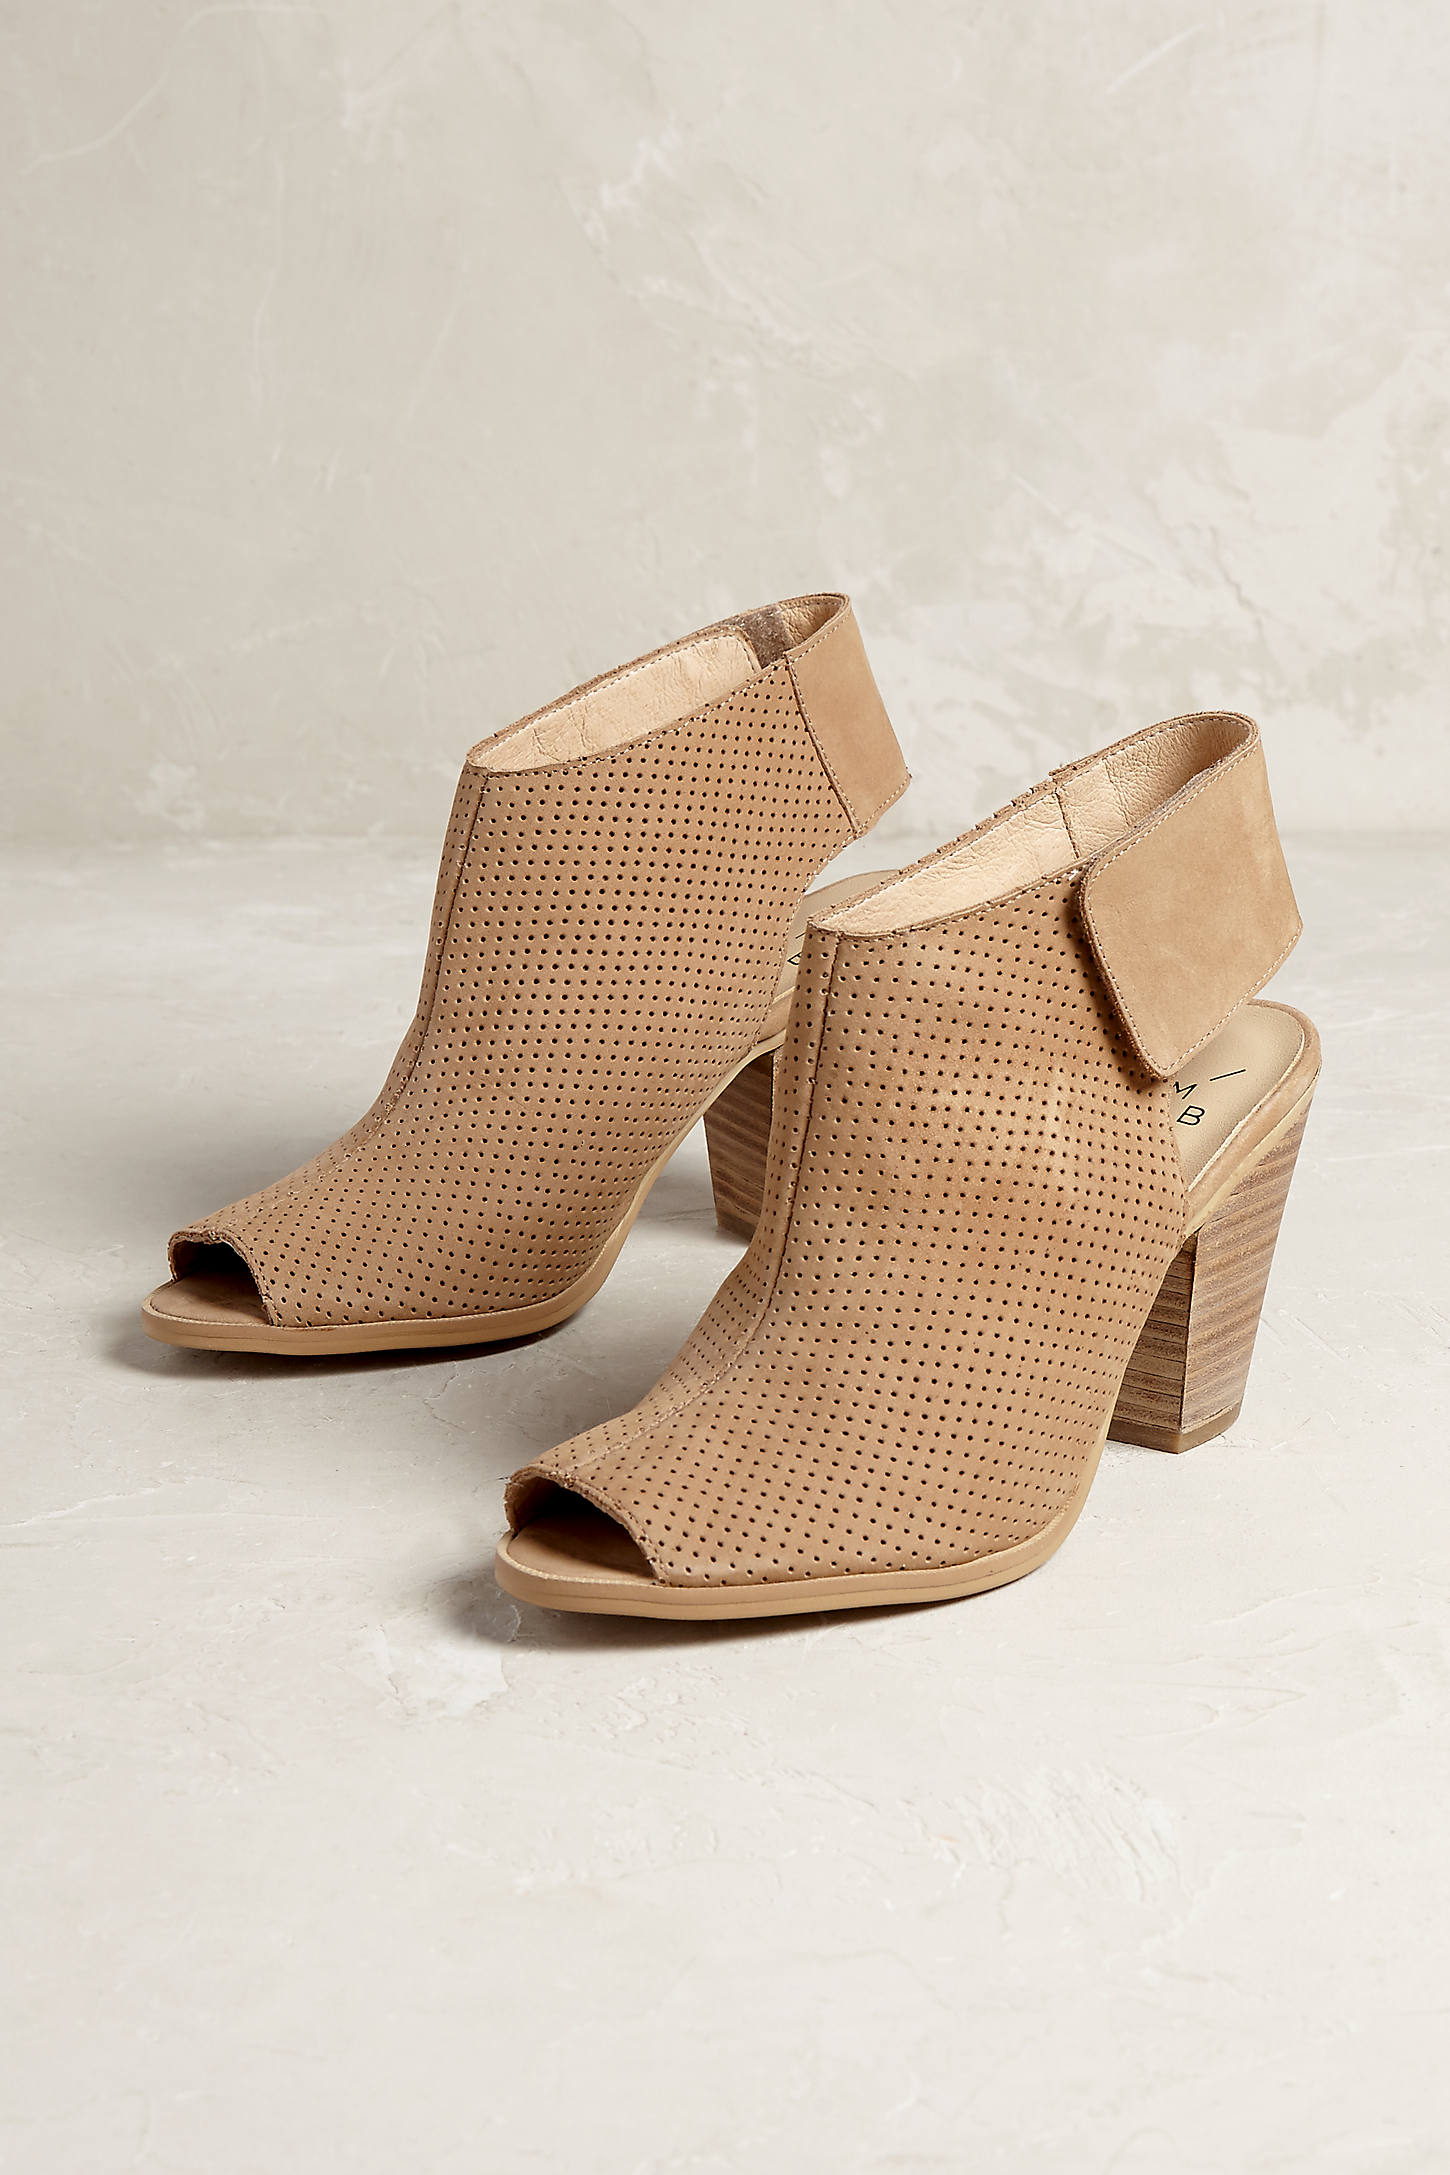 Kora Perforated Heels